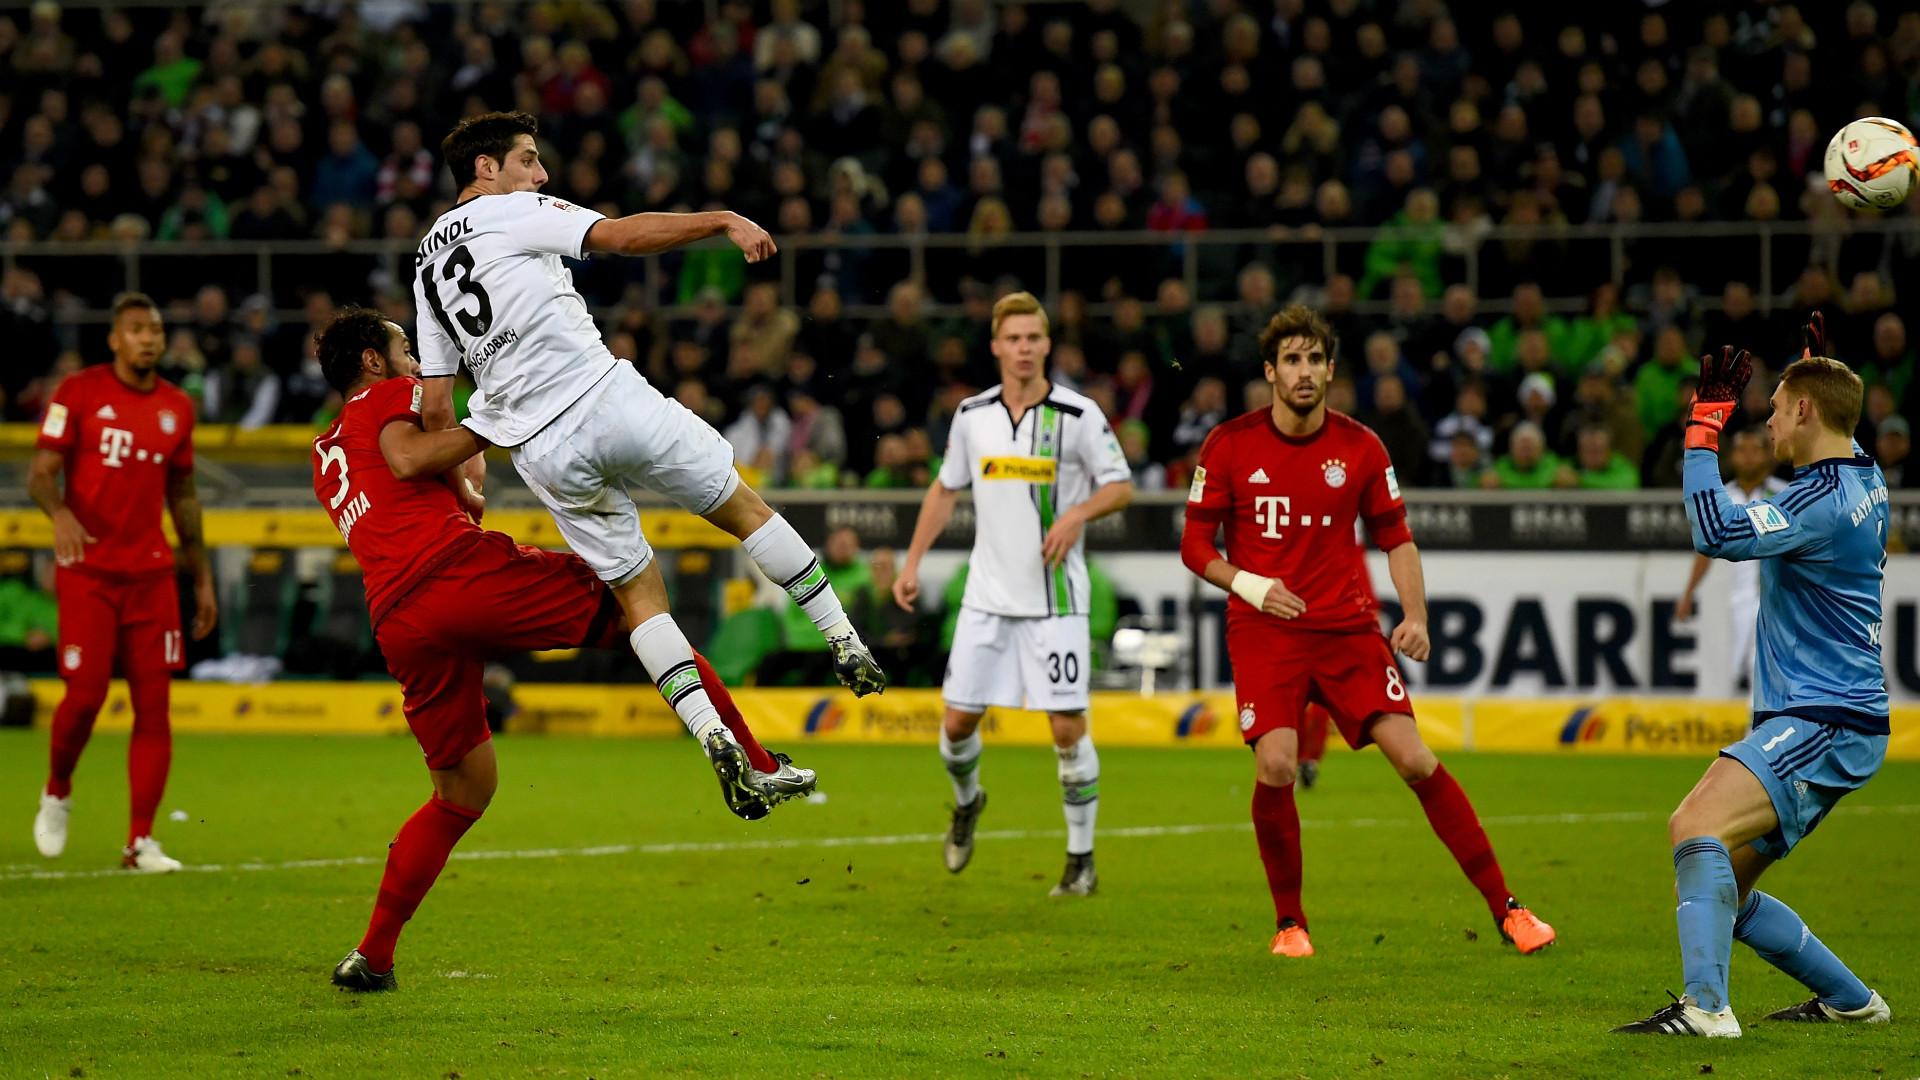 Video: Borussia M gladbach vs Bayern Munich